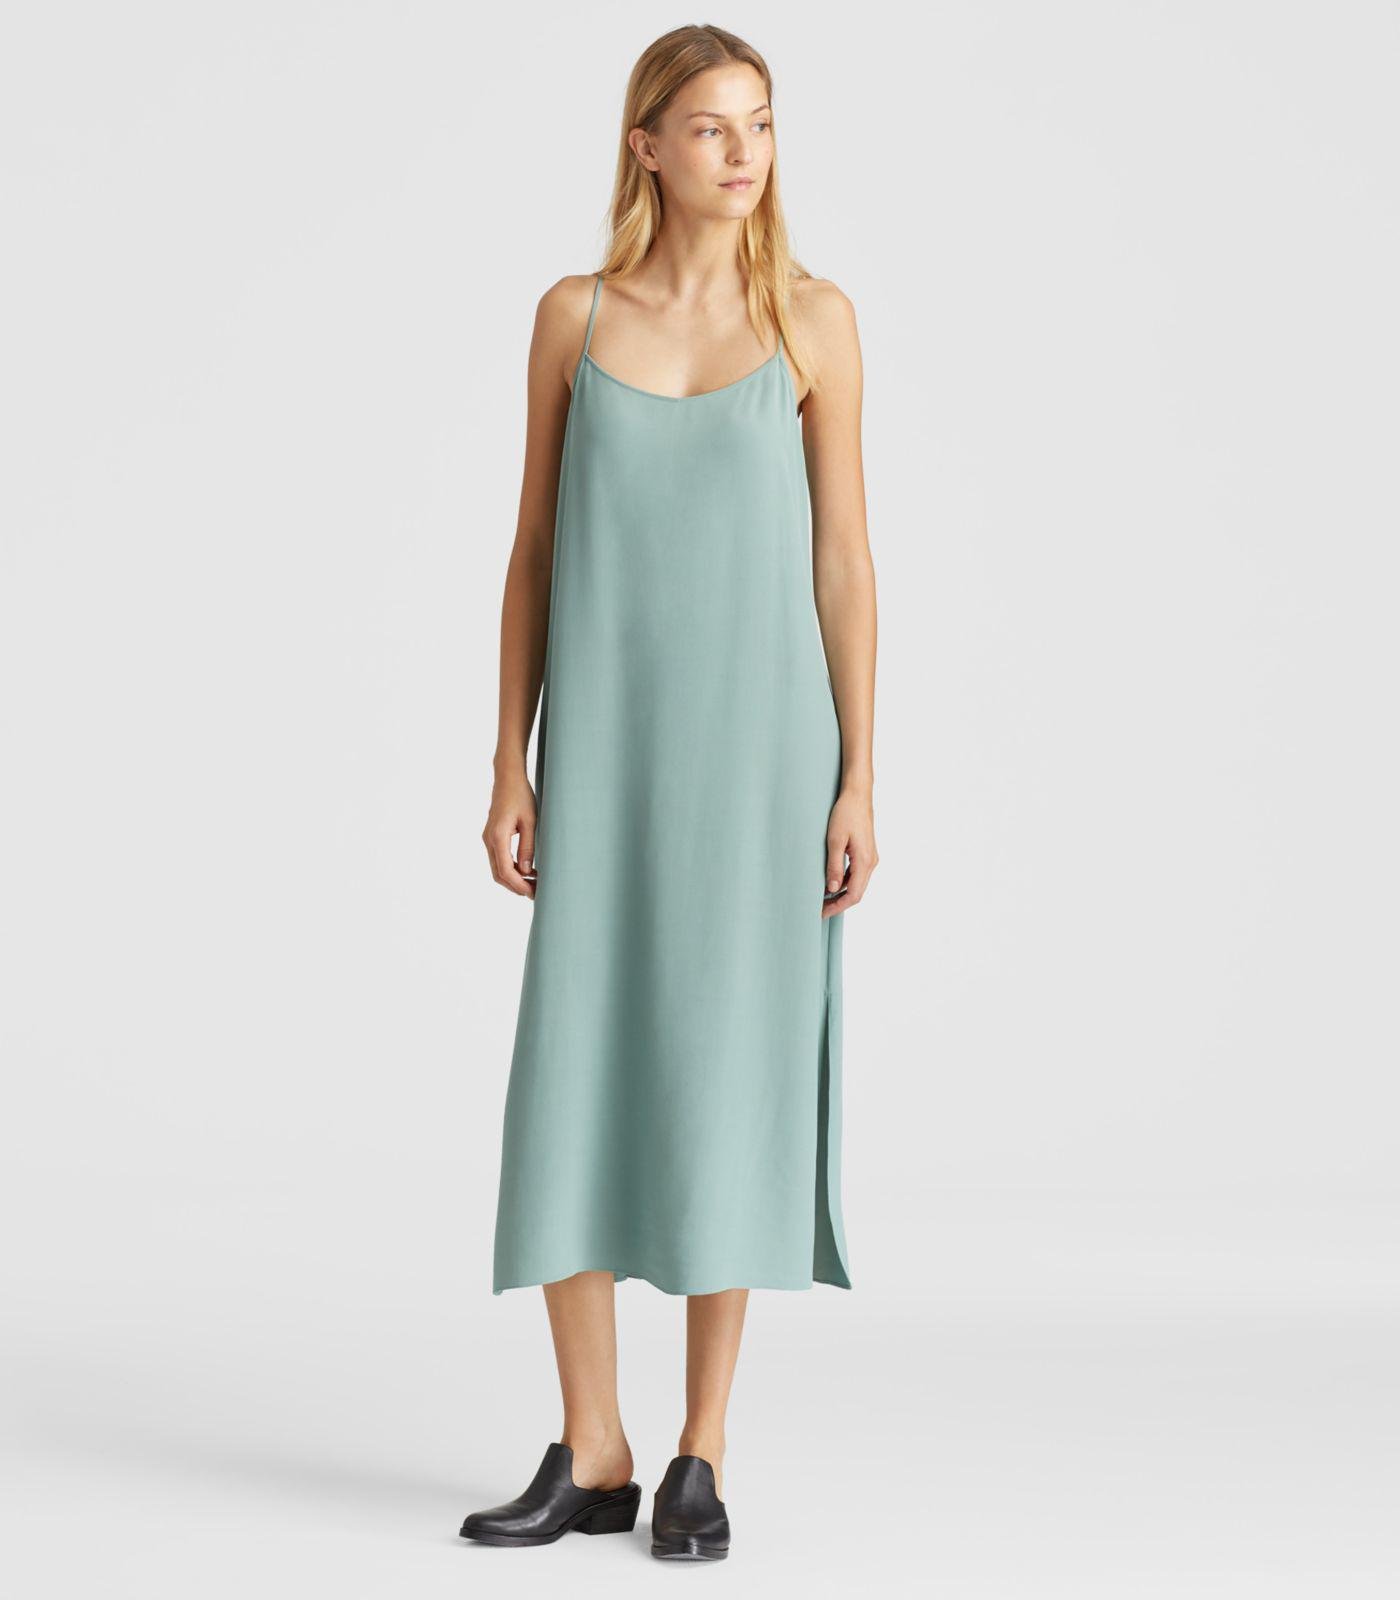 367f90b6e6 Lyst - Eileen Fisher Viscose Crepe Slip Dress in Green